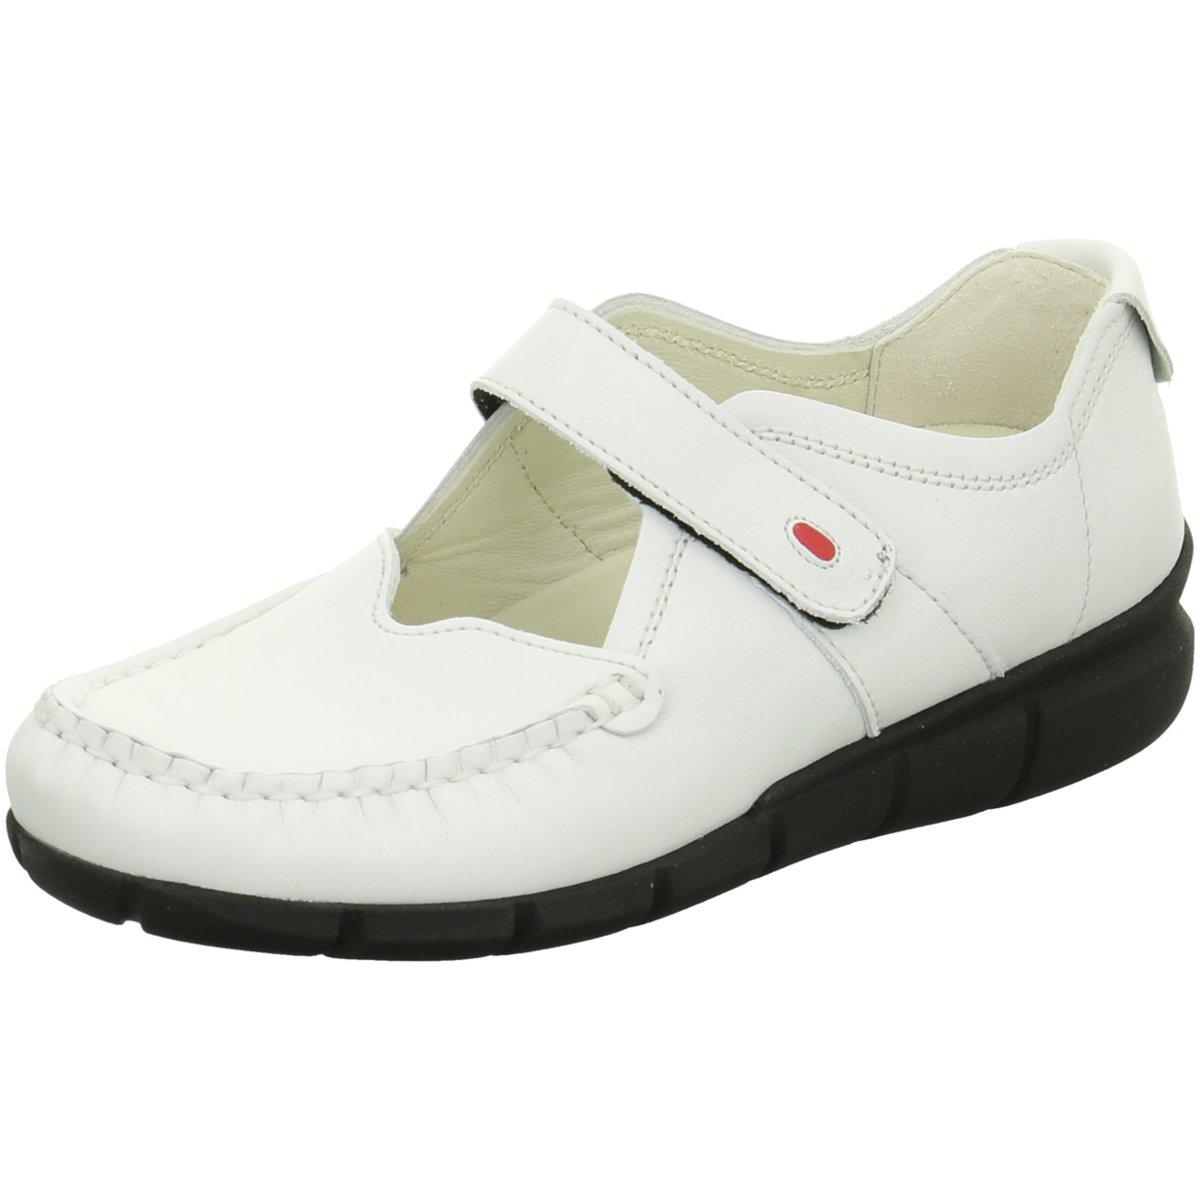 NEU Wolky Damen Slipper Yukon White Leoa leather 1500710 weiß 233709